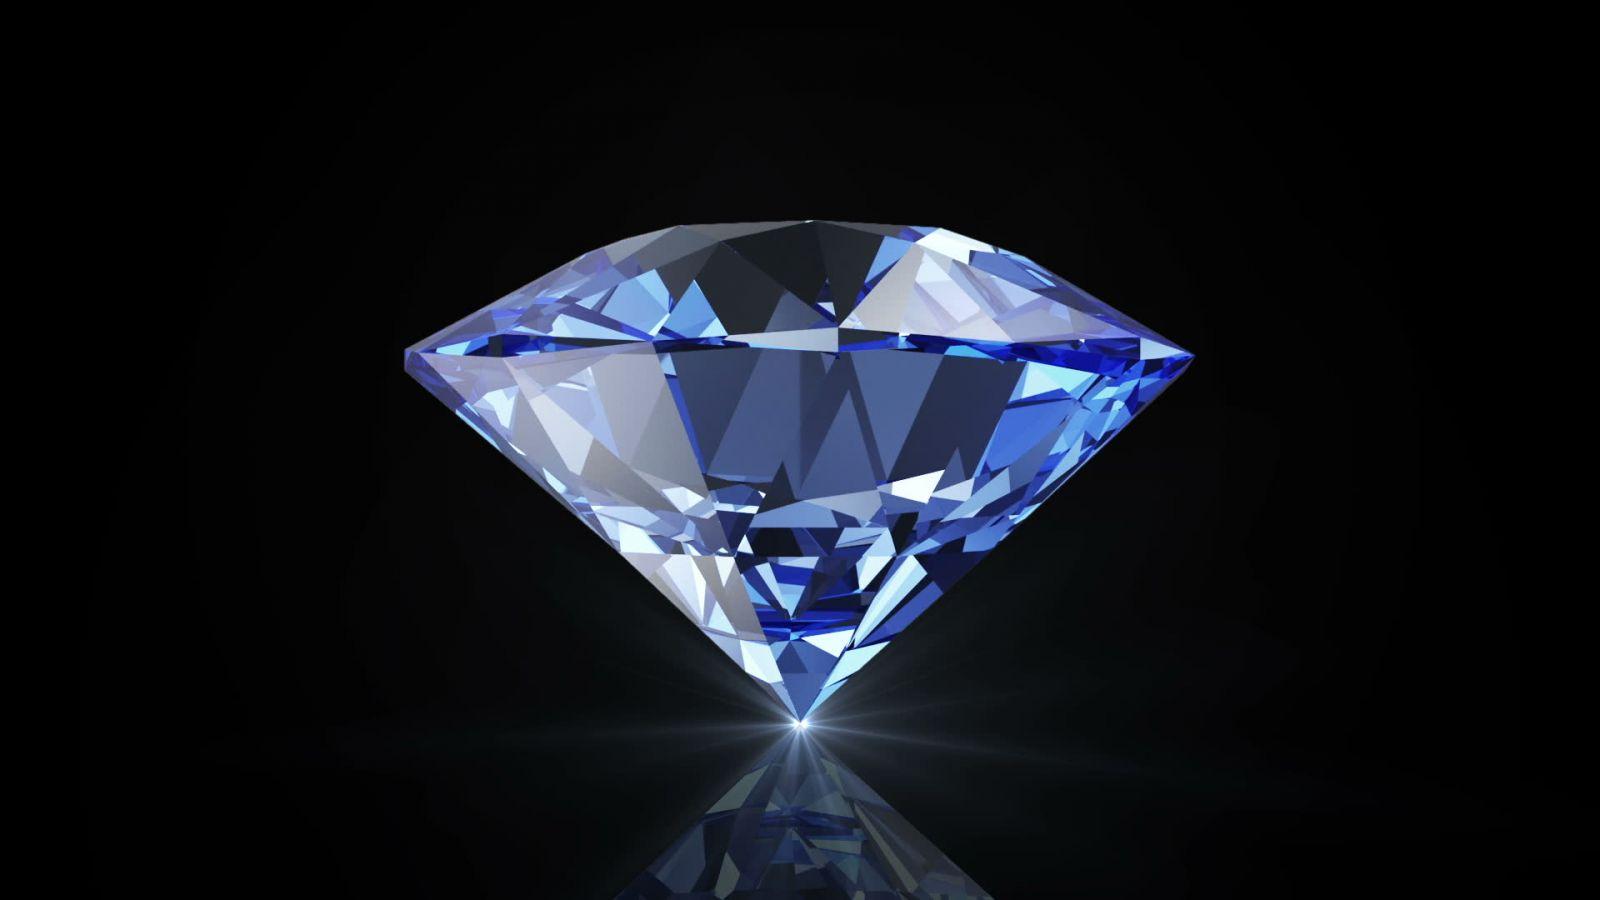 Тяжелые бриллианты, бриллианты Латинской Америки, vigiljournal.com